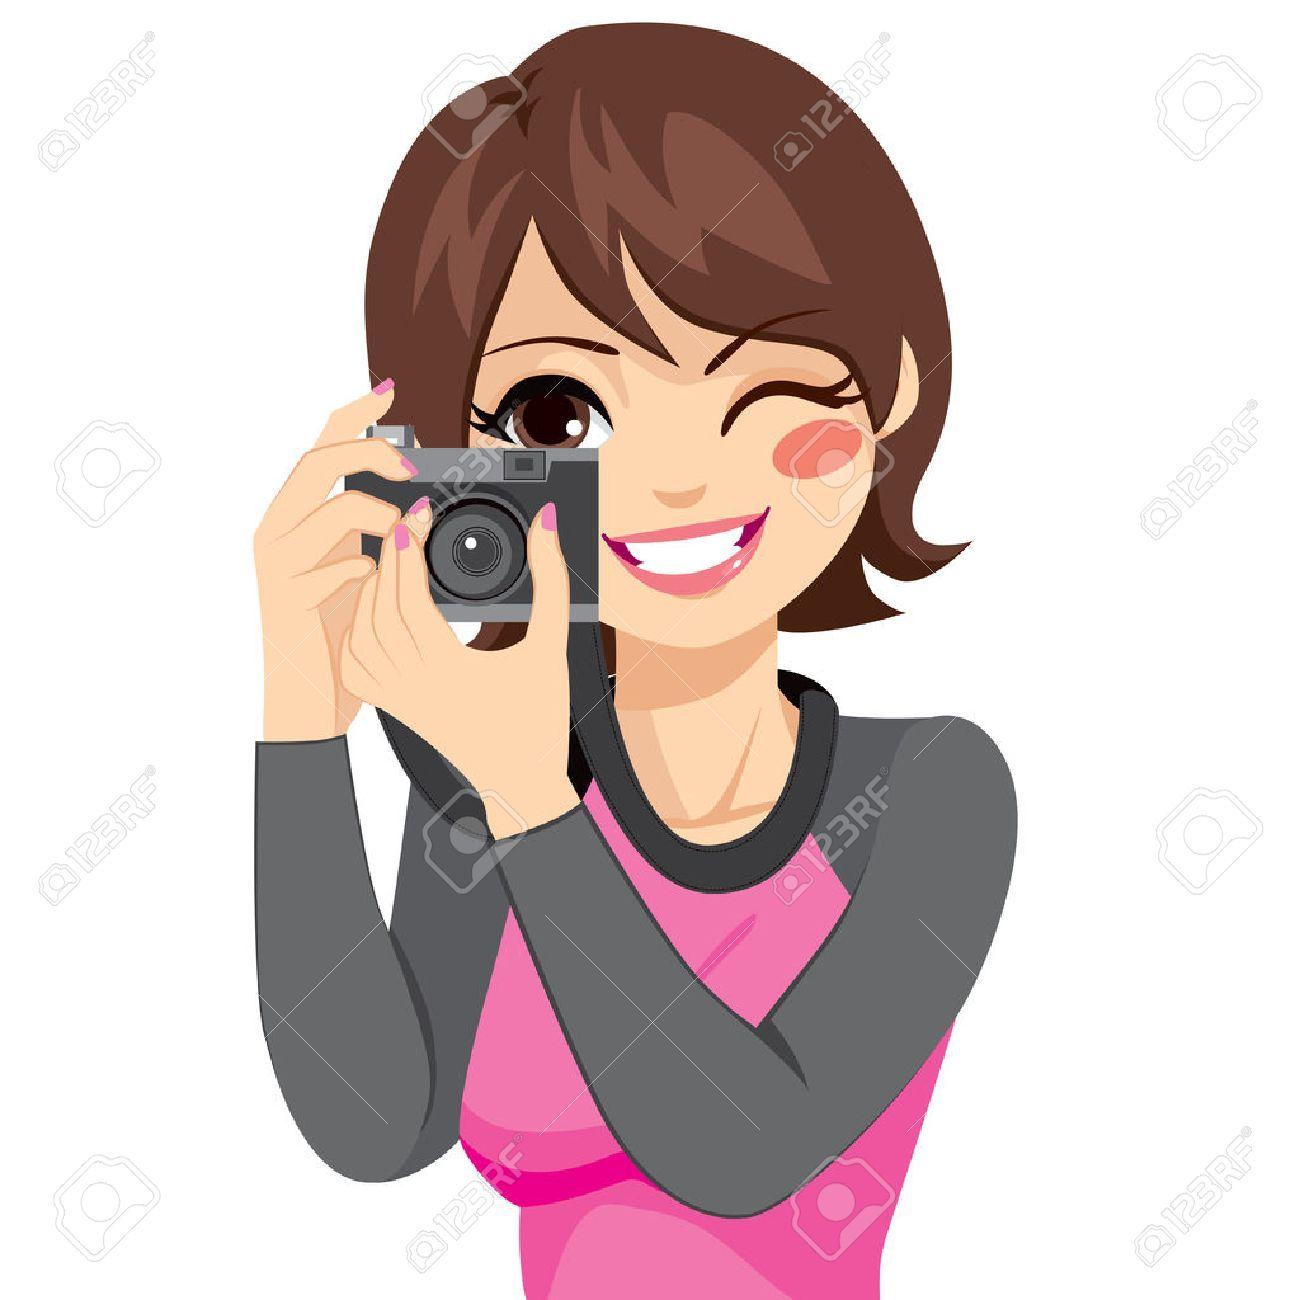 Feliz Hermosa Mujer Sonriente Fotografo Toma La Foto Usando La Camara Vieja Analogica Retro Camaras Viejas Fotos Viejitos